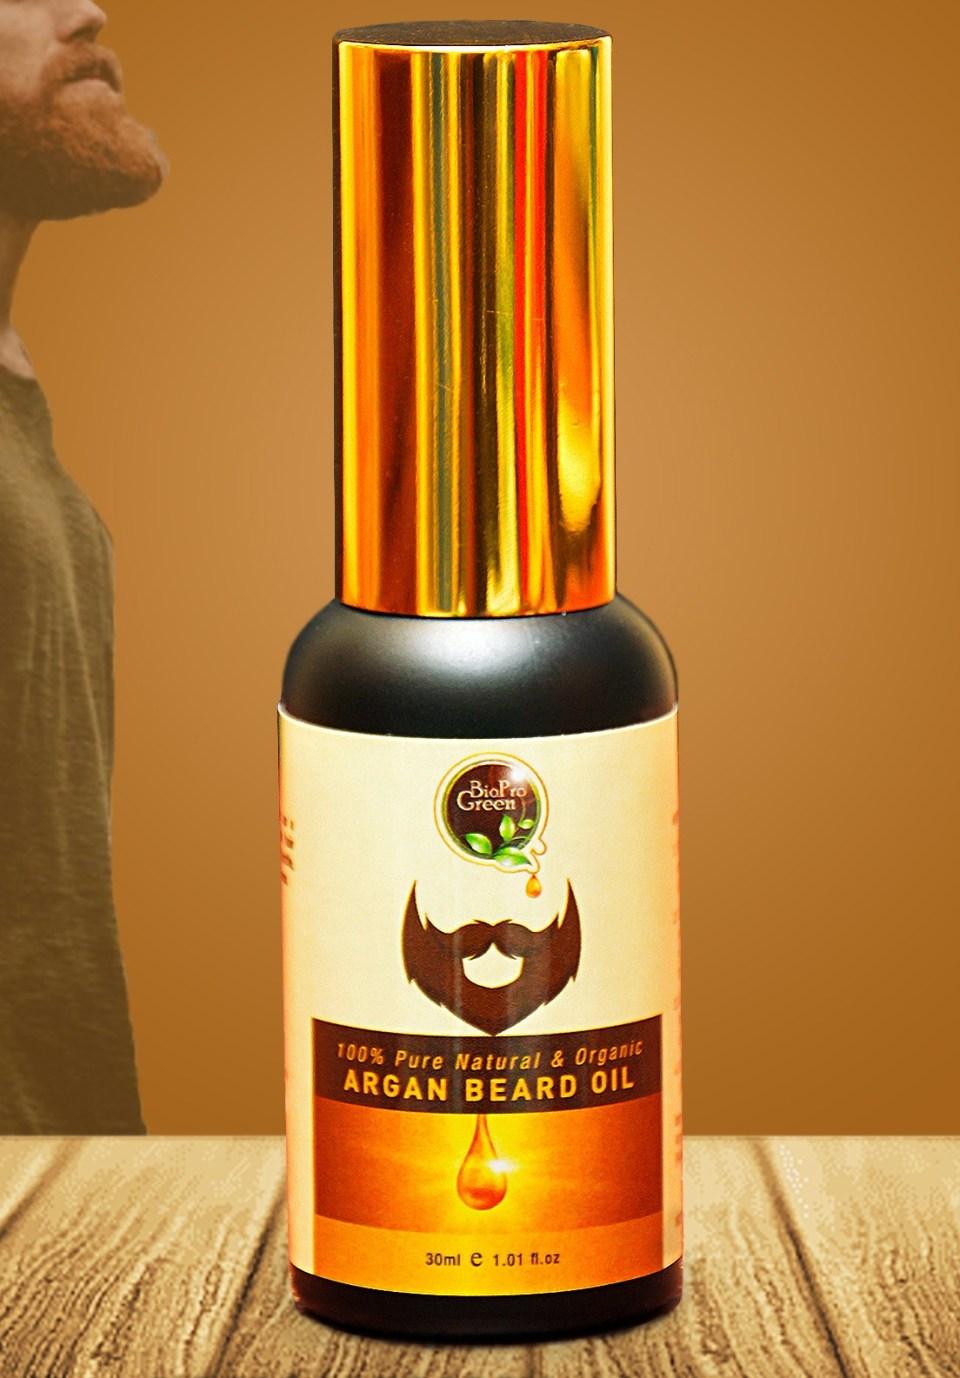 BioProGreen Argan Beard Oil